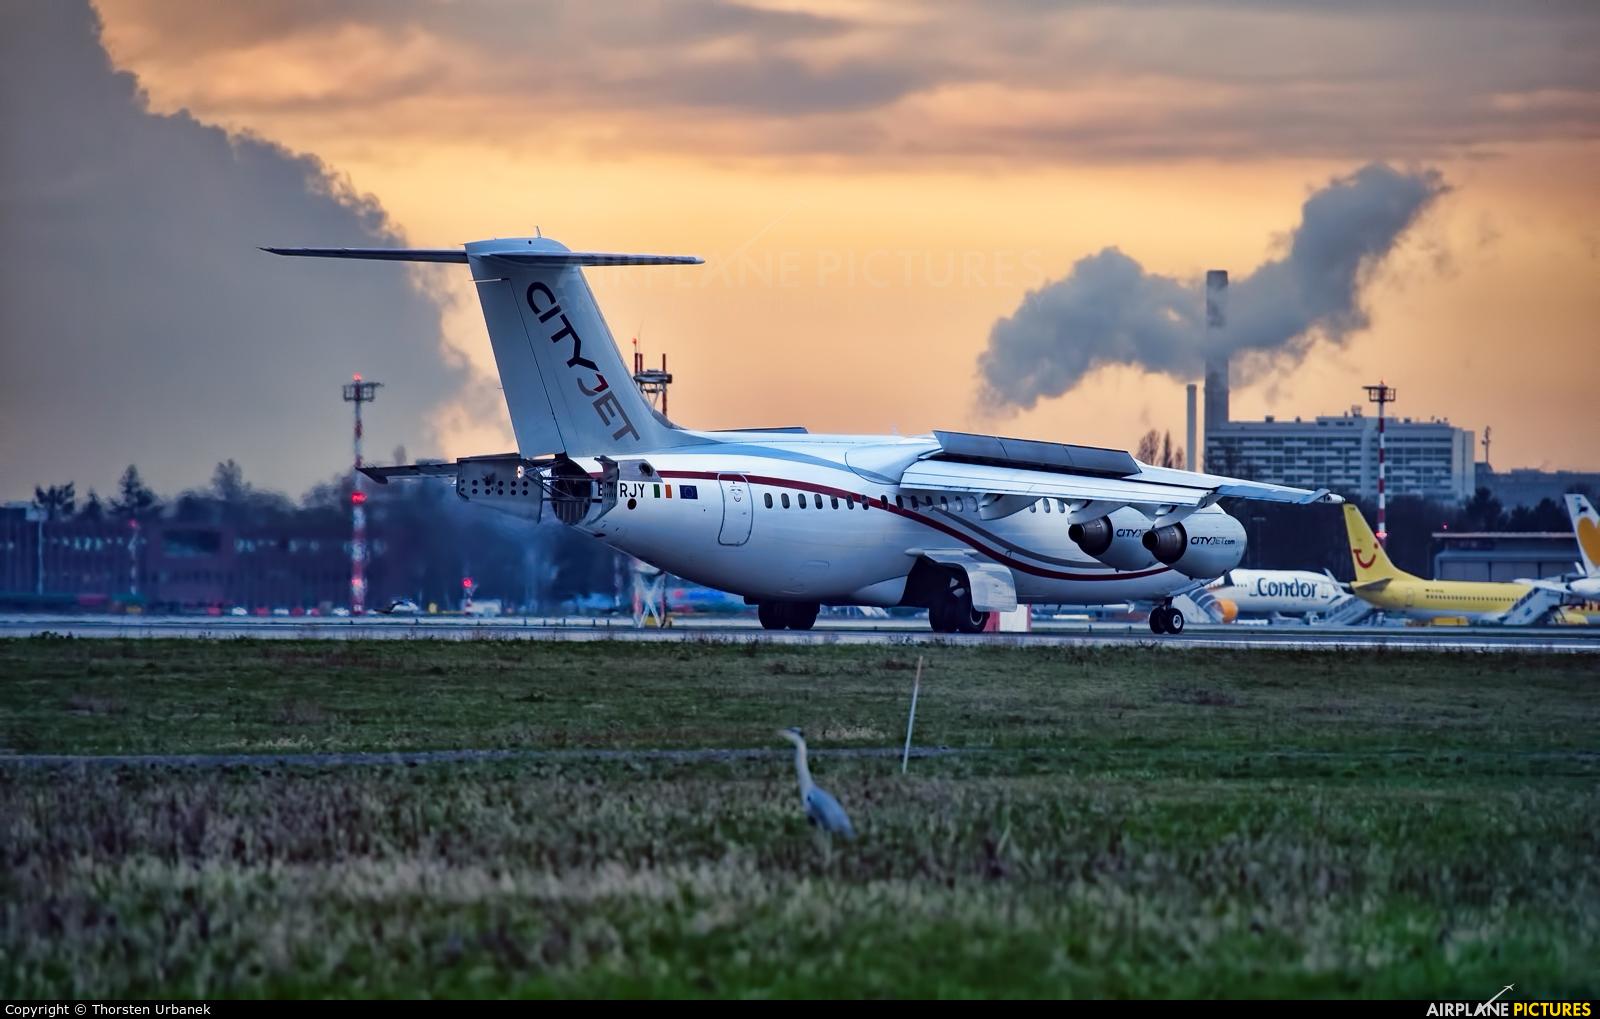 CityJet EI-RJY aircraft at Düsseldorf